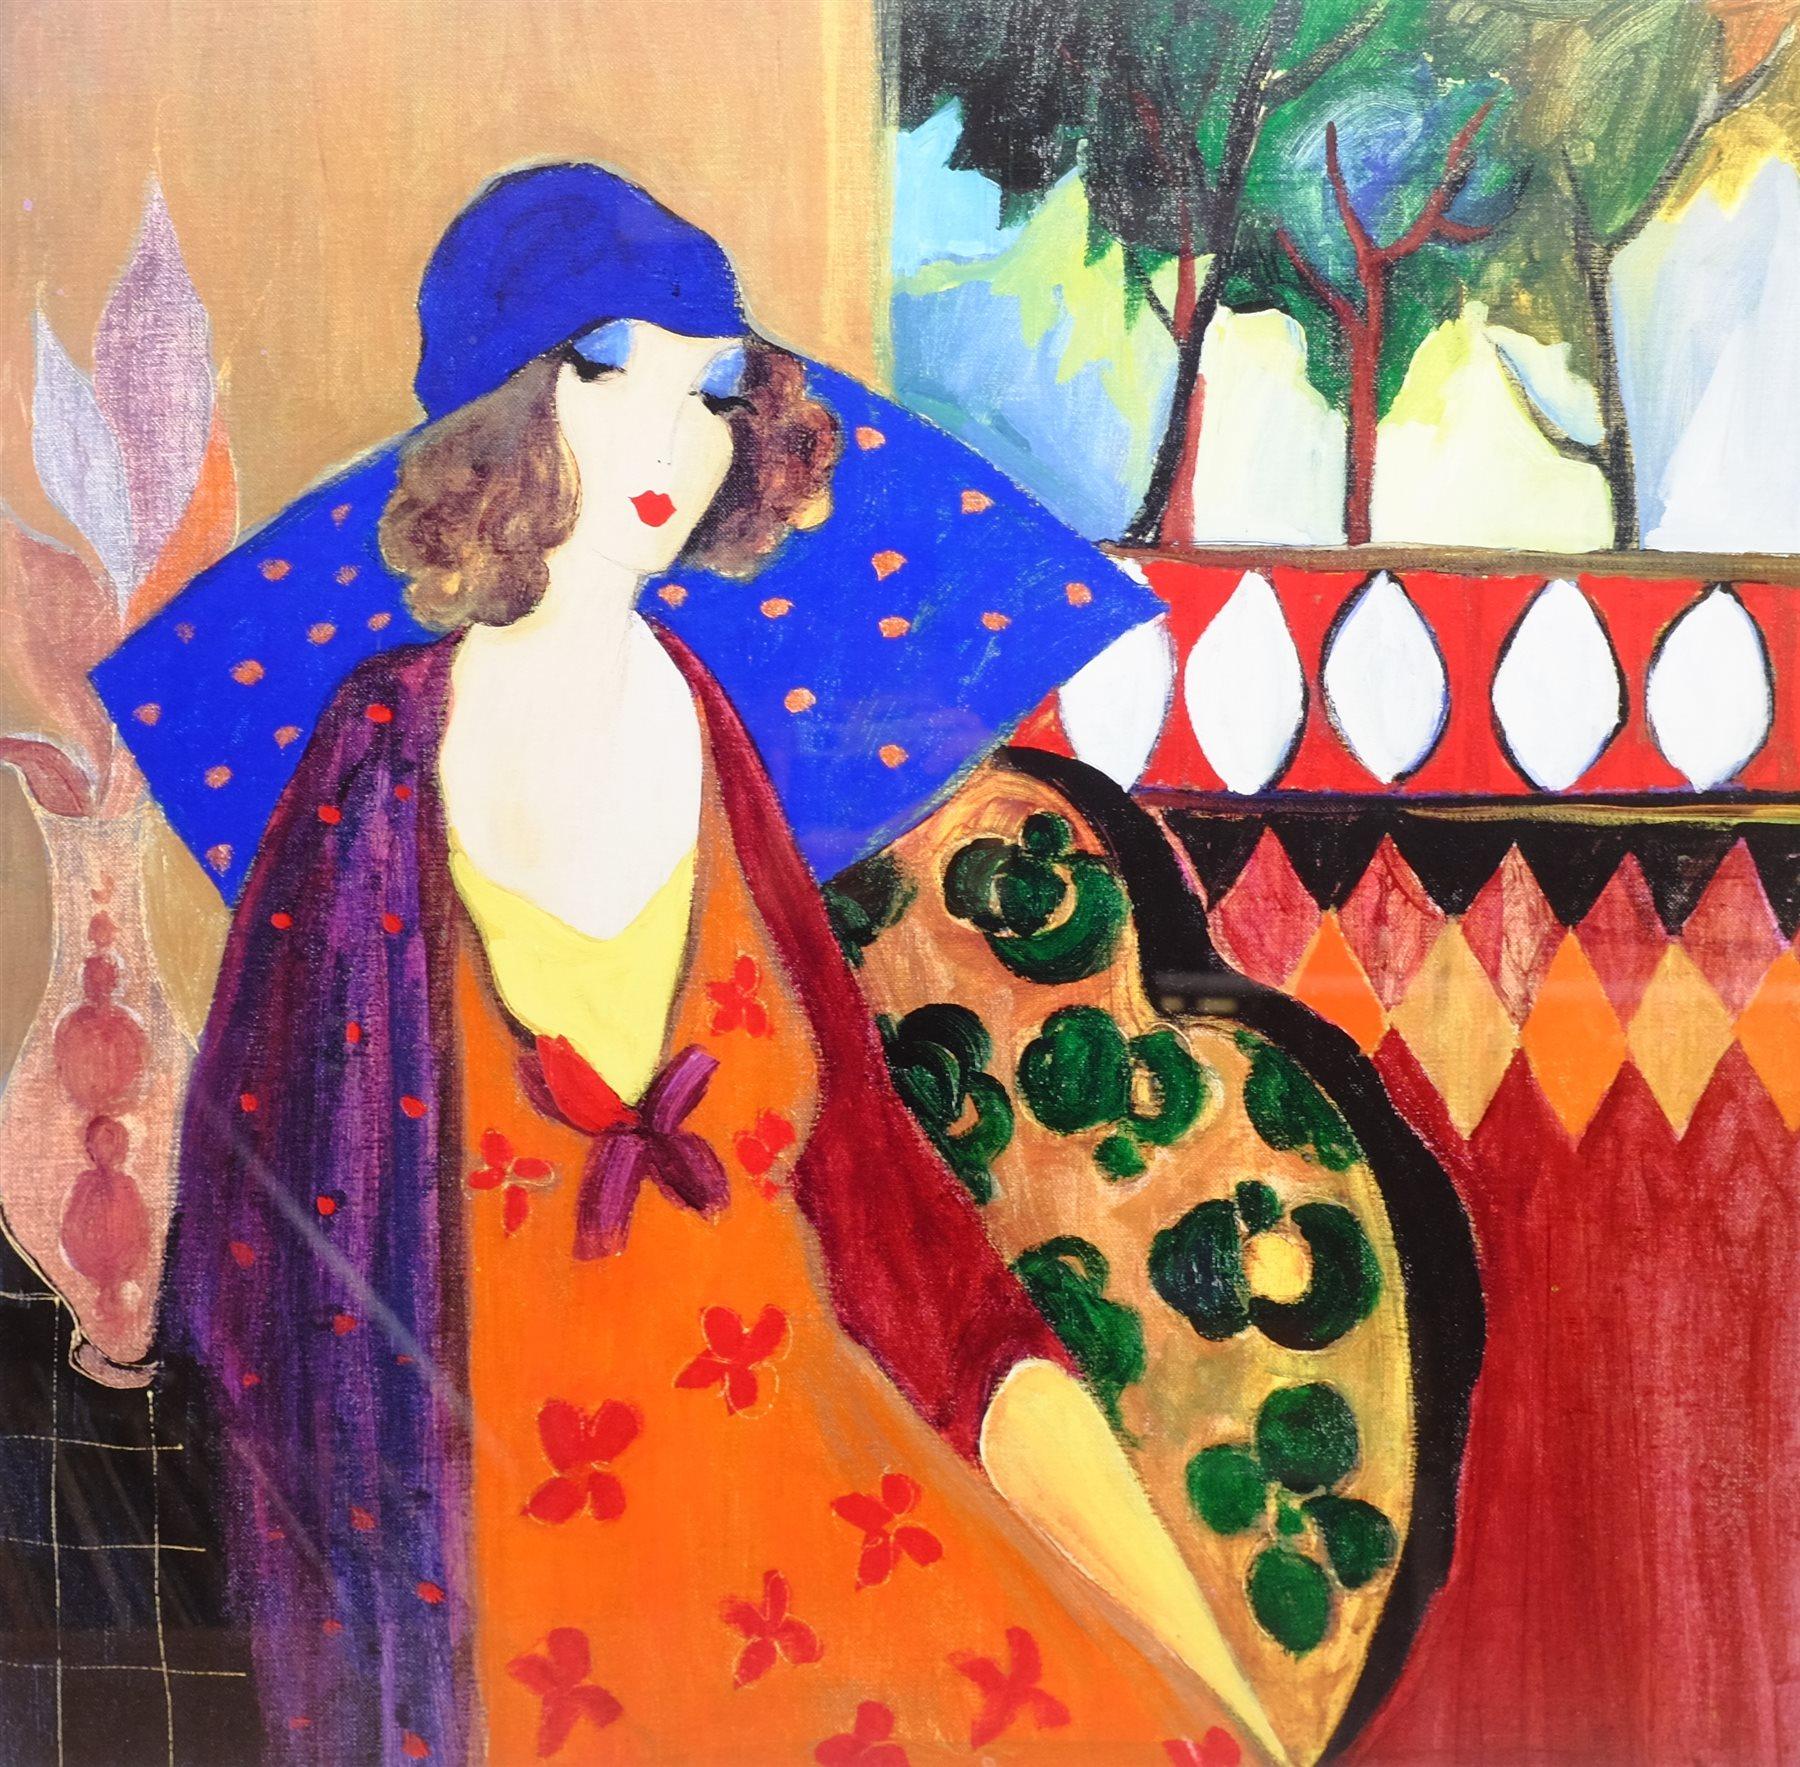 After Itzchak Tarkay (Israeli 1935-2012): 'Indigo Chapeau', colour print 63cm x 64cm - Image 2 of 4